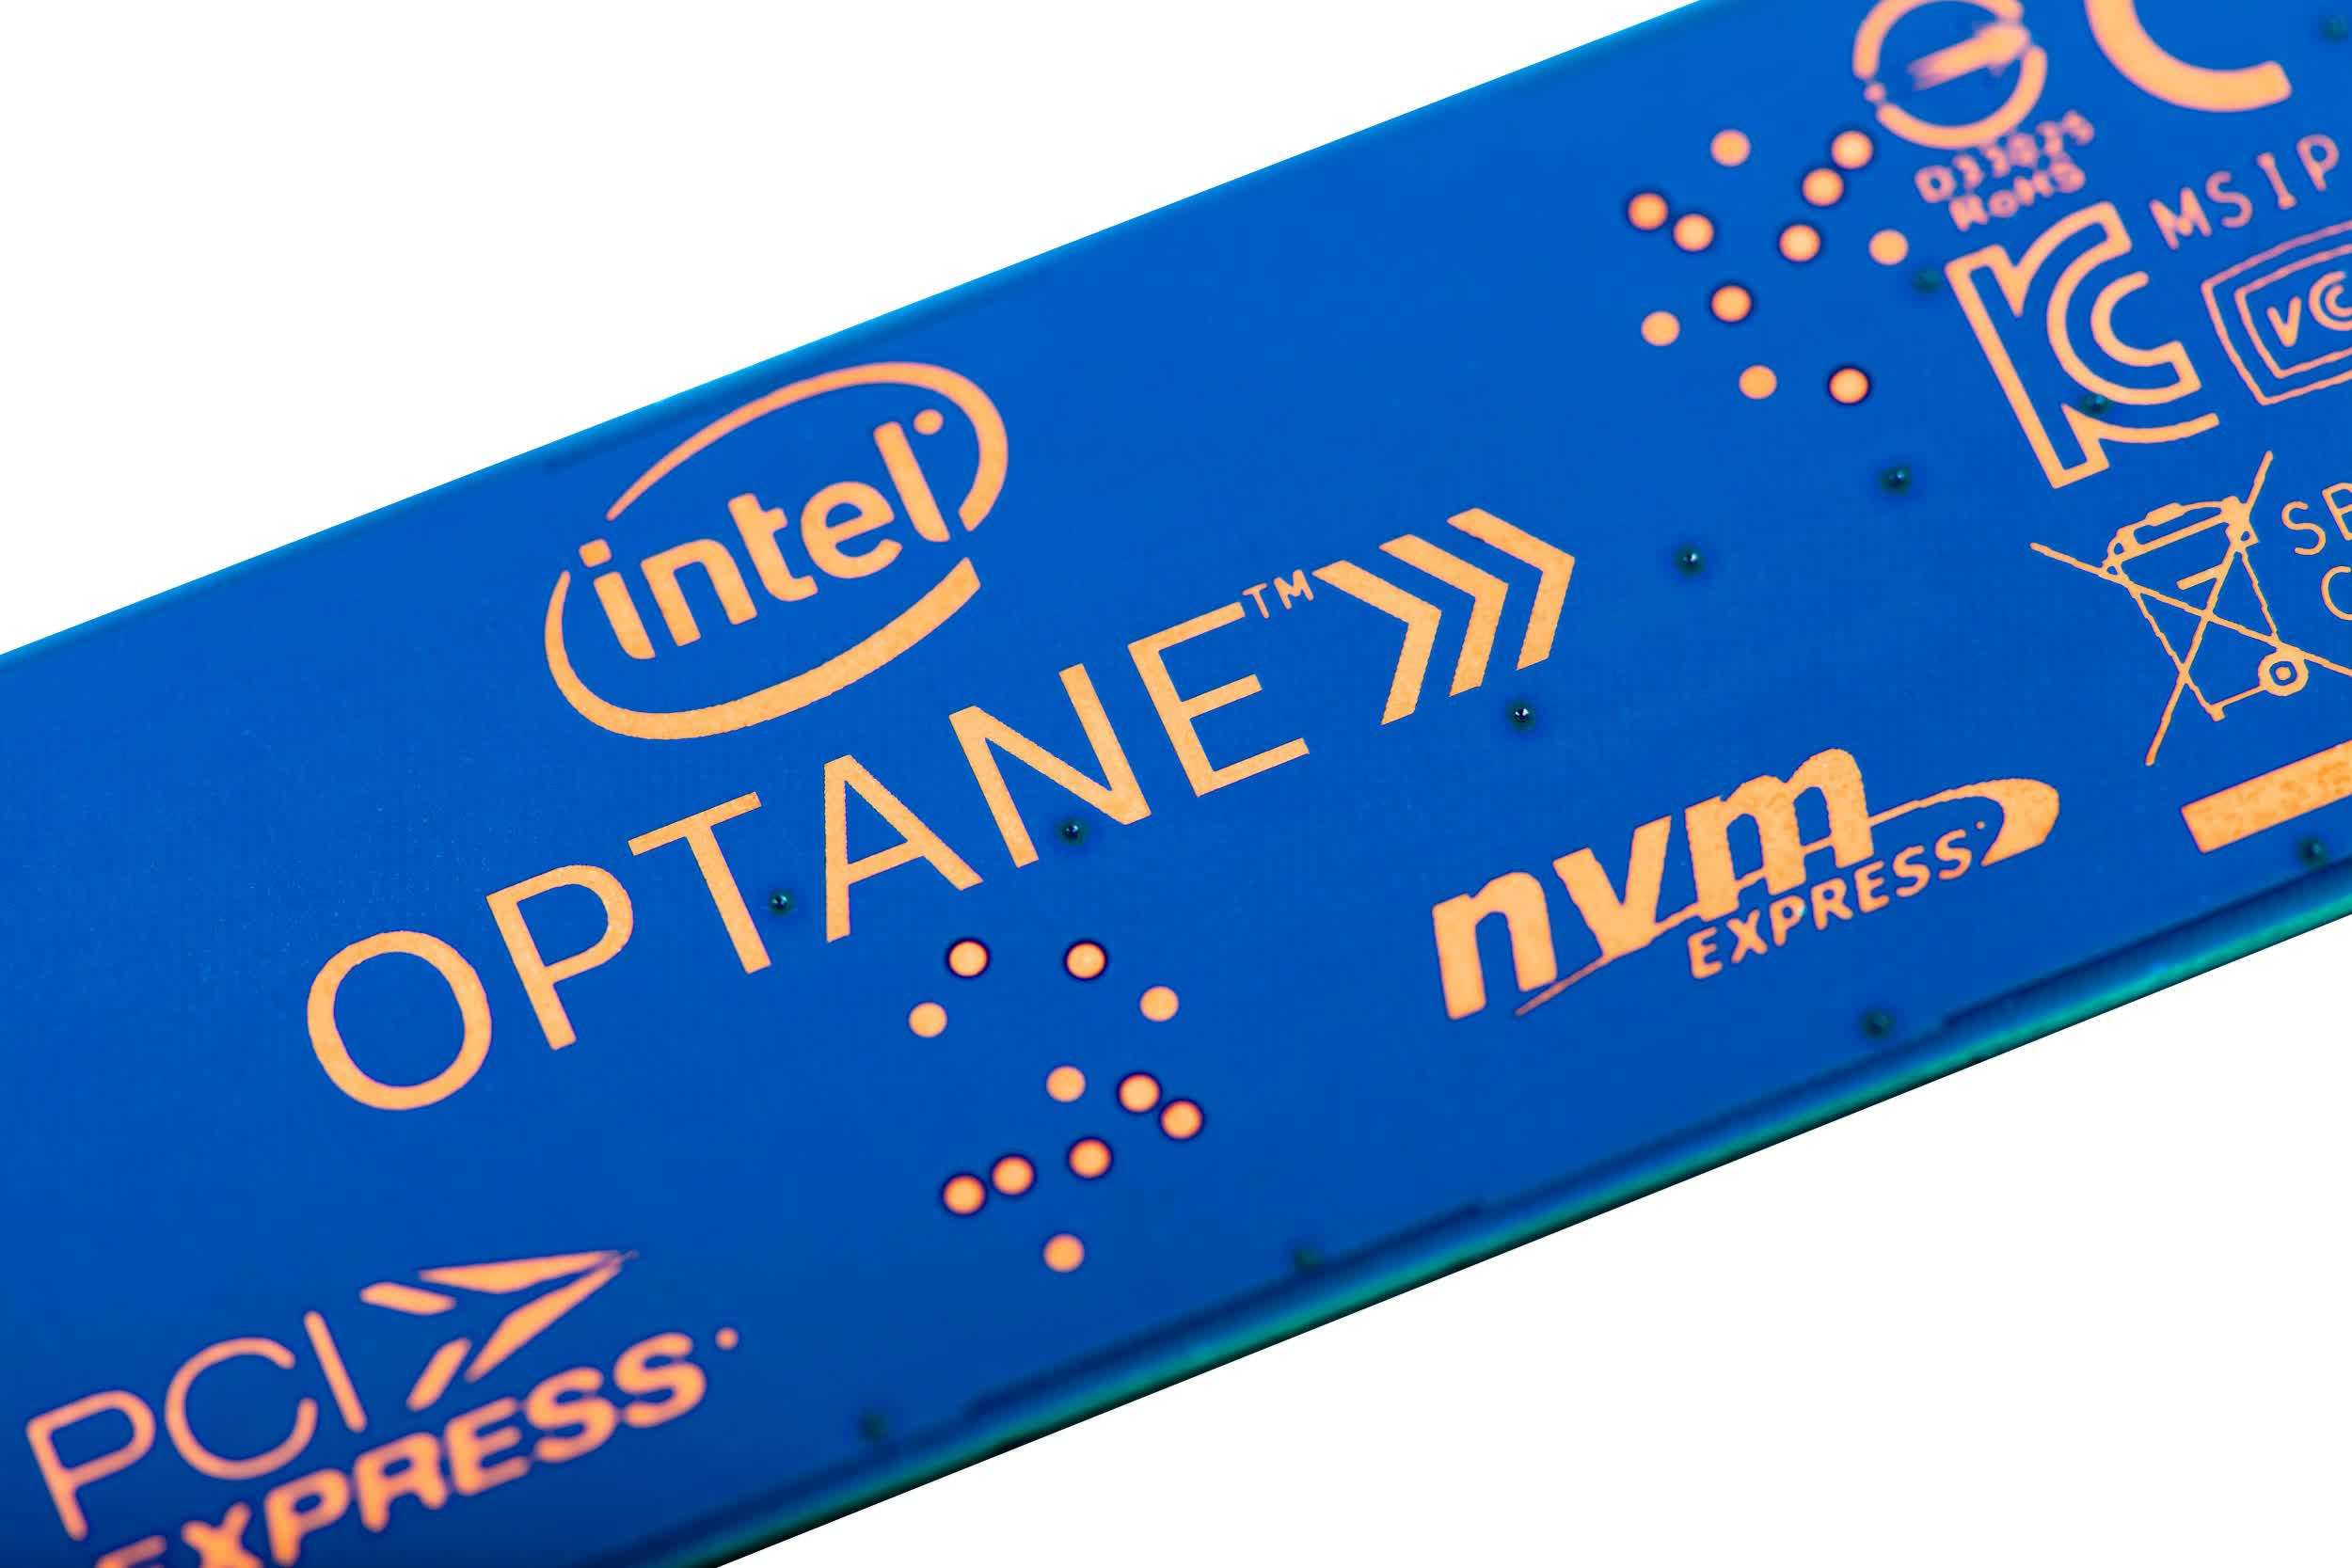 Micron vend son ancienne usine 3D XPoint a Texas Instruments